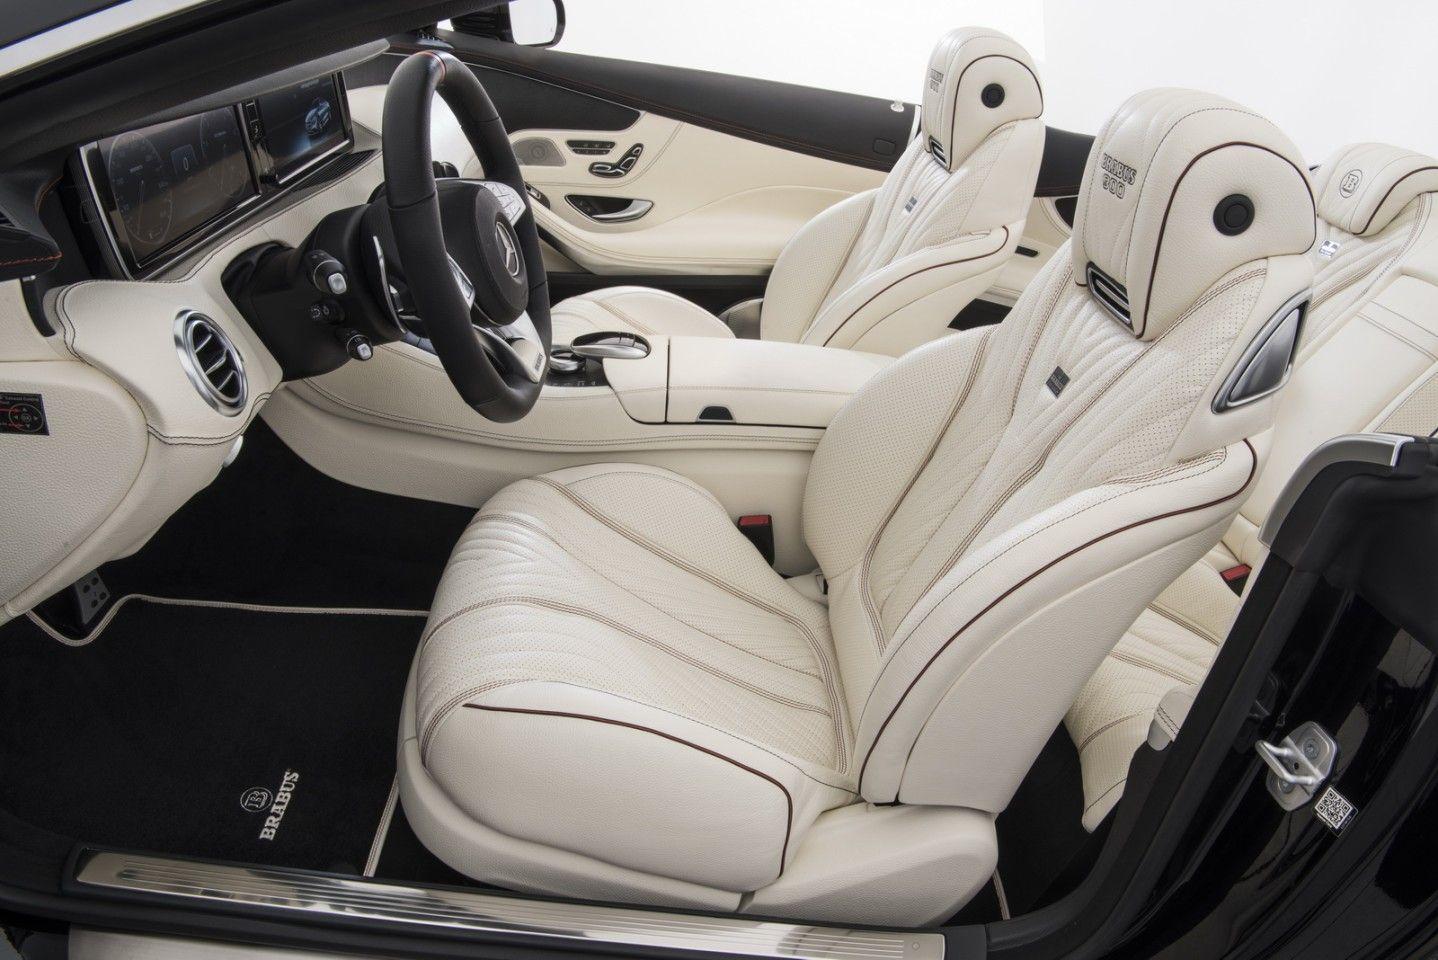 Brabus Rocket 900 Cabrio world's fastest fourseat